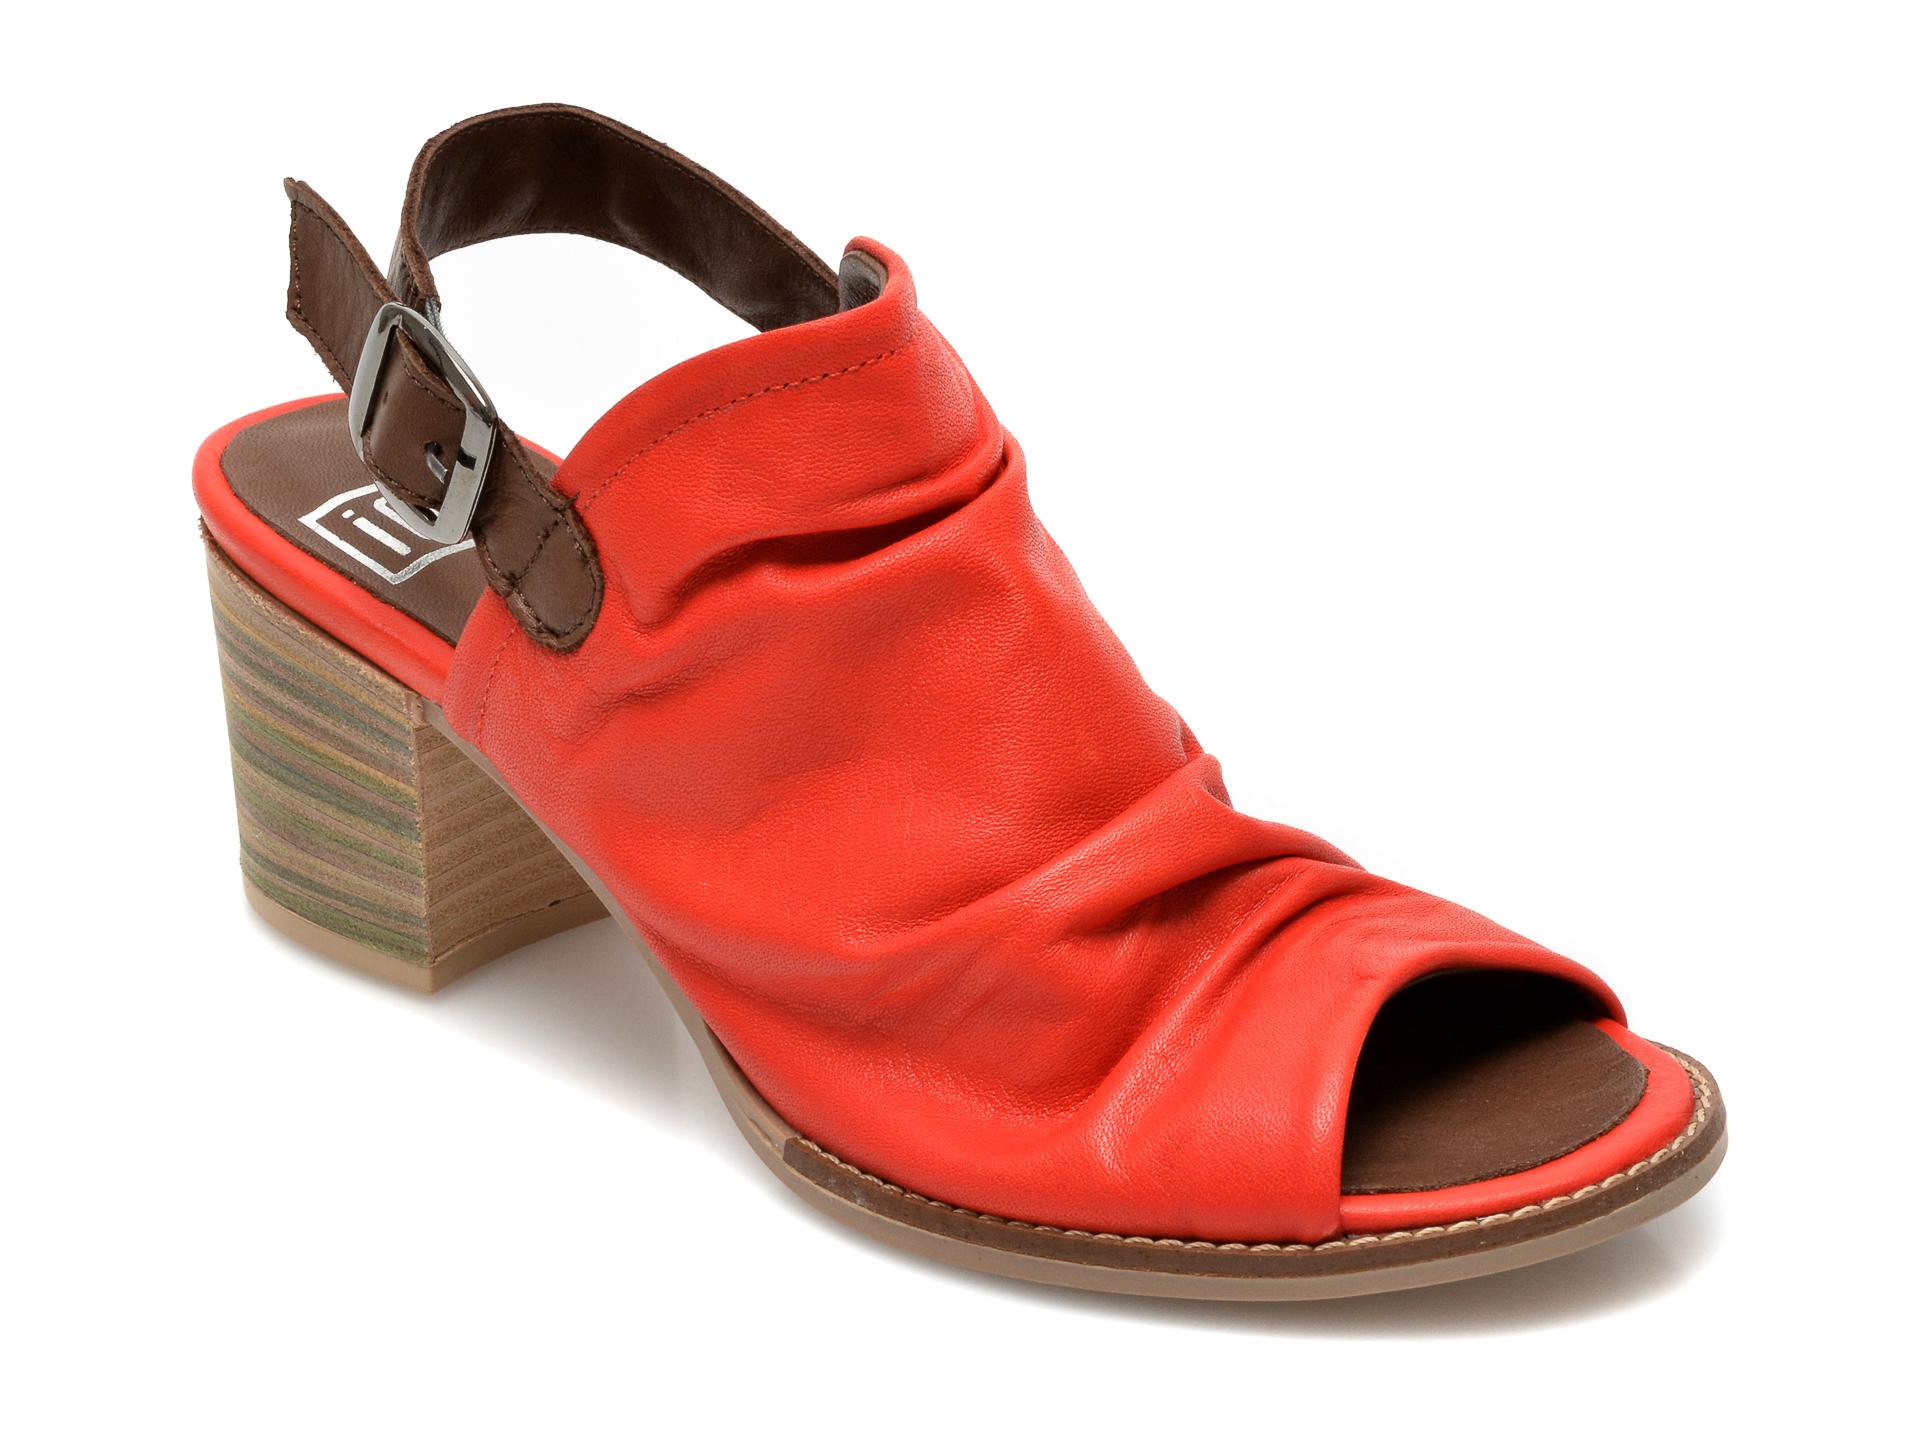 Sandale IOU rosii, 1702, din piele naturala imagine otter.ro 2021